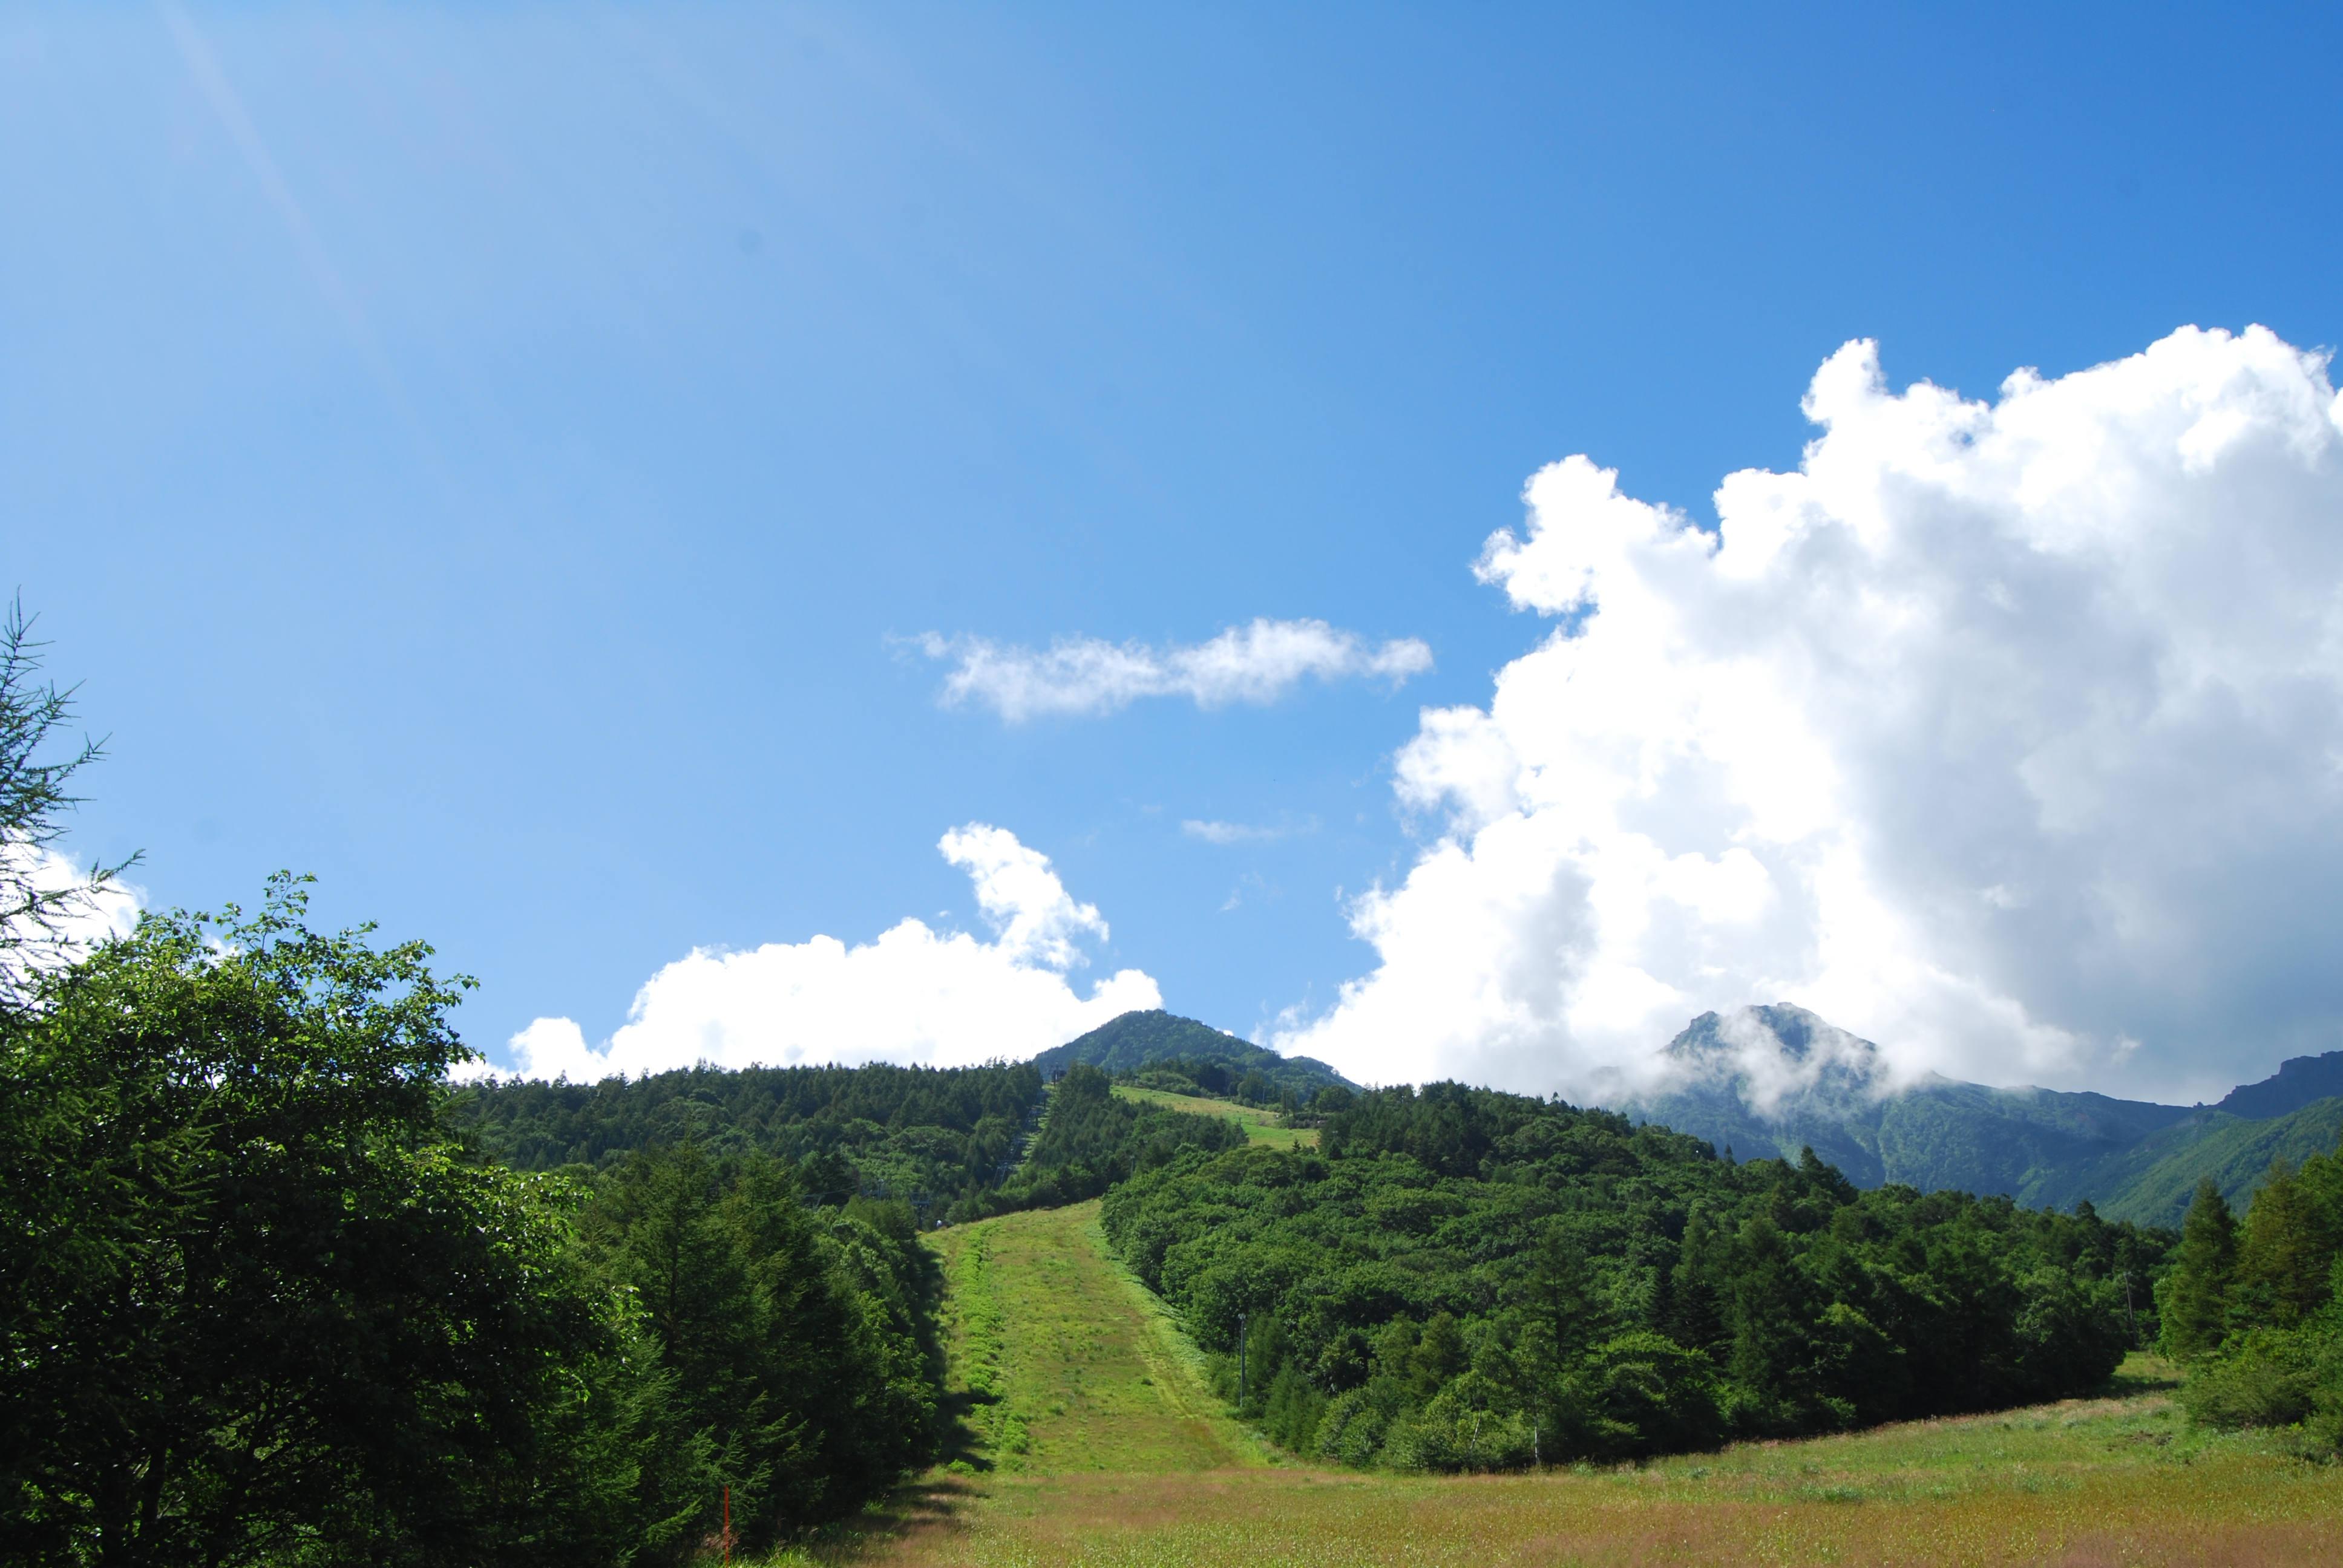 Ski slope on Sun Meadows, Kiyosato, Yamanashi, Japan